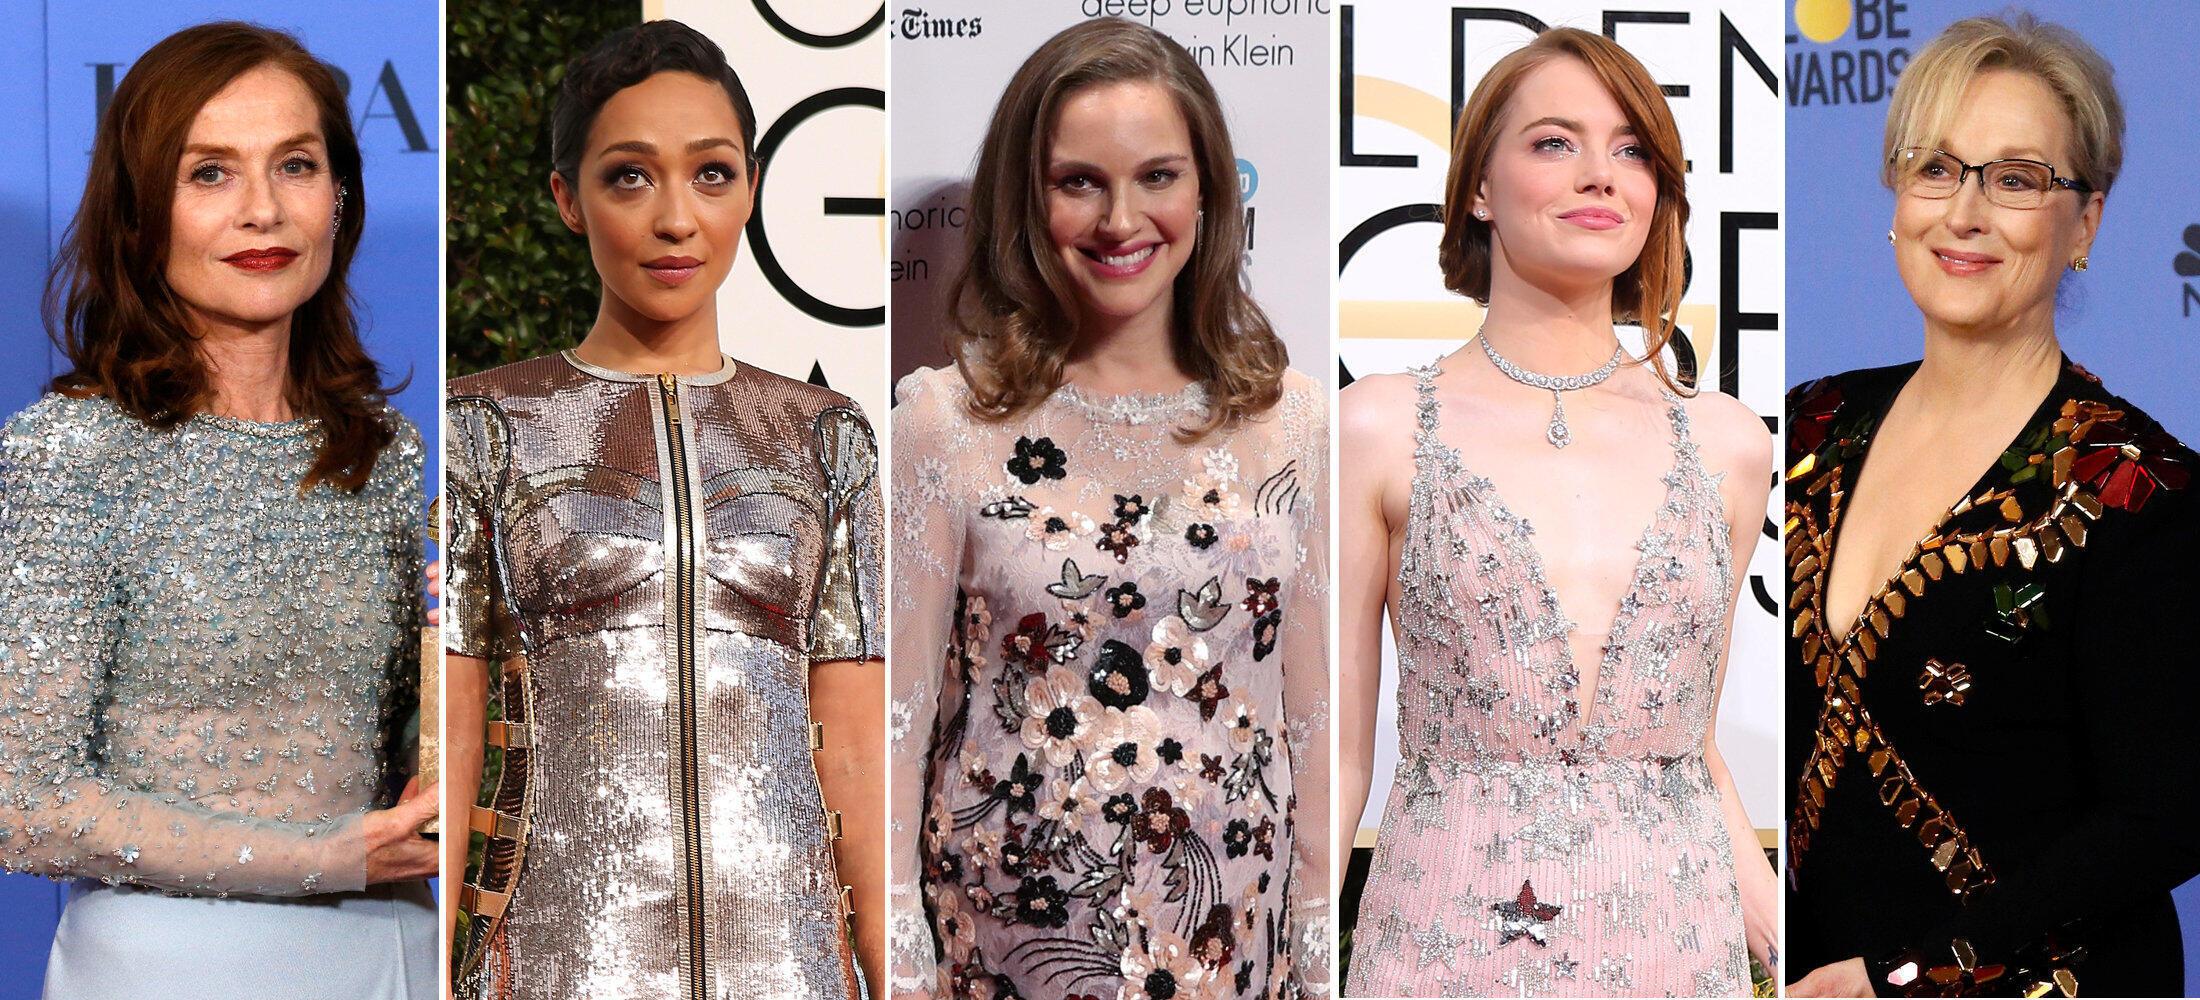 As atrizes Isabelle Huppert, Ruth Negga, Natalie Portman, Emma Stone e Meryl Streep